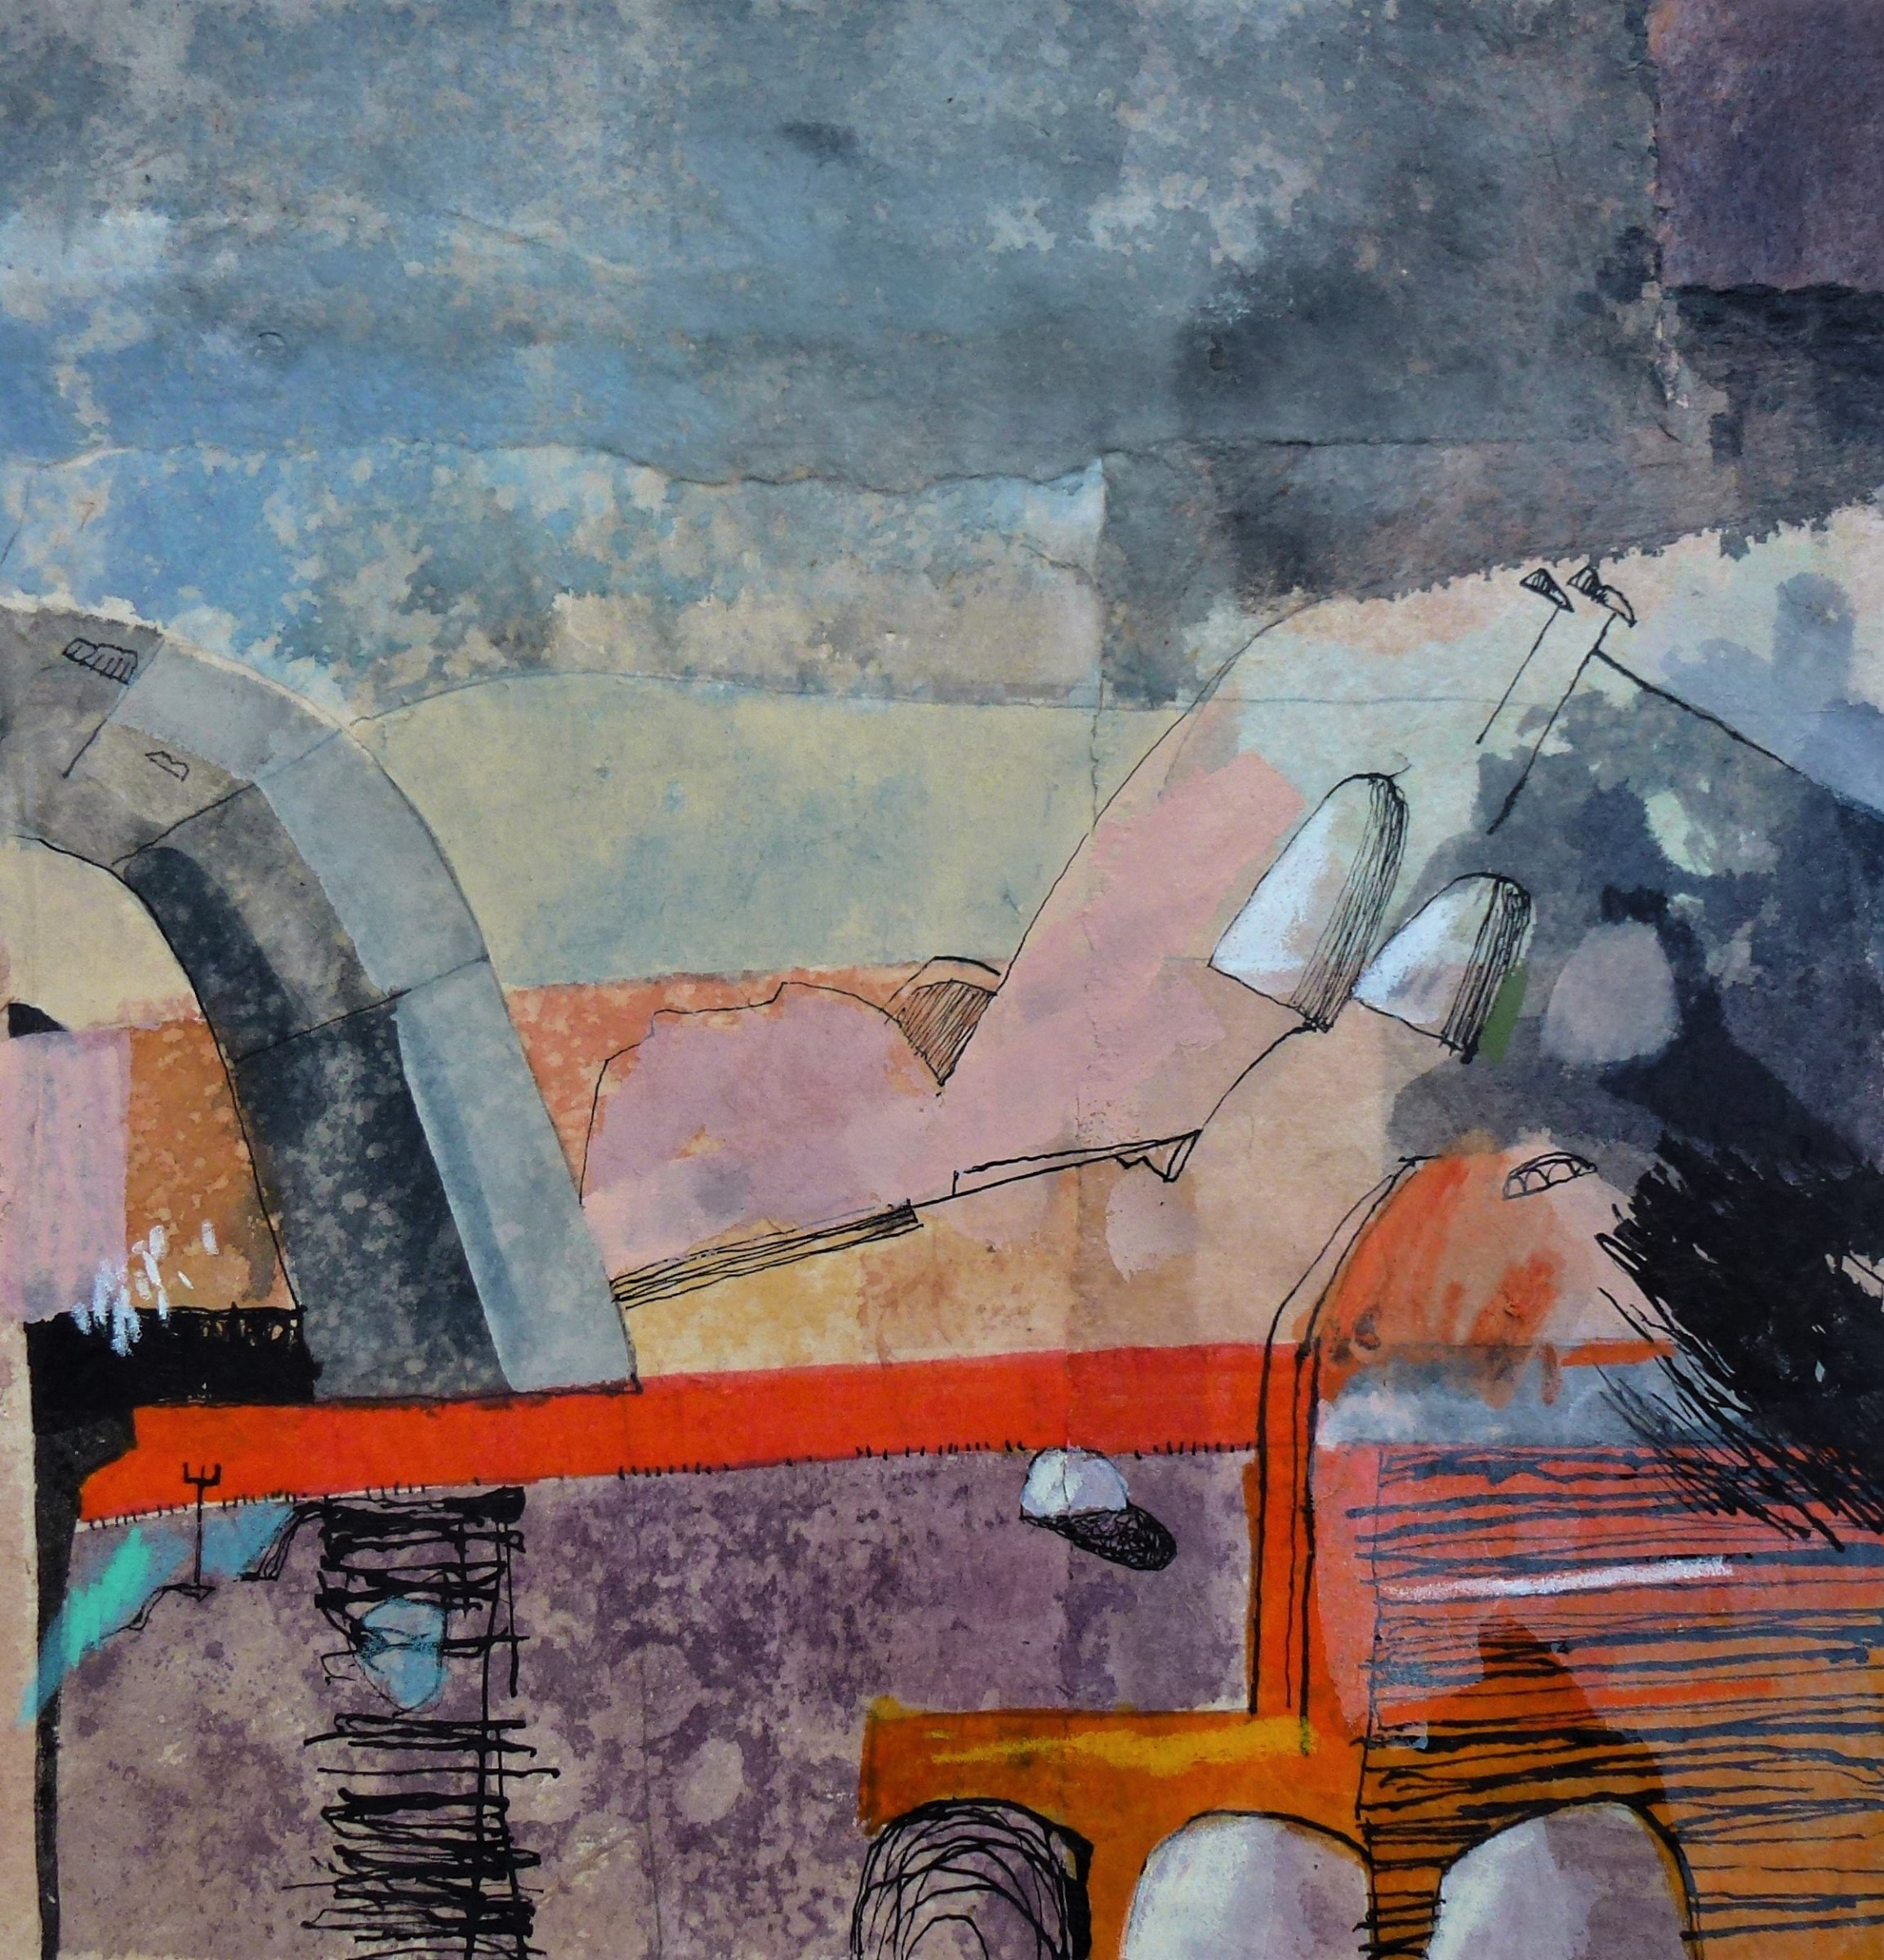 "<span class=""link fancybox-details-link""><a href=""/artists/315-claire-denny/works/12046-claire-denny-welsh-hillside/"">View Detail Page</a></span><div class=""artist""><span class=""artist""><strong>Claire Denny</strong></span></div><div class=""title""><em>Welsh Hillside</em></div><div class=""medium"">collage, watercolour & ink</div><div class=""dimensions"">Frame: 35 x 35 cm<br /> Artwork: 20 x 20 cm</div><div class=""price"">£375.00</div>"